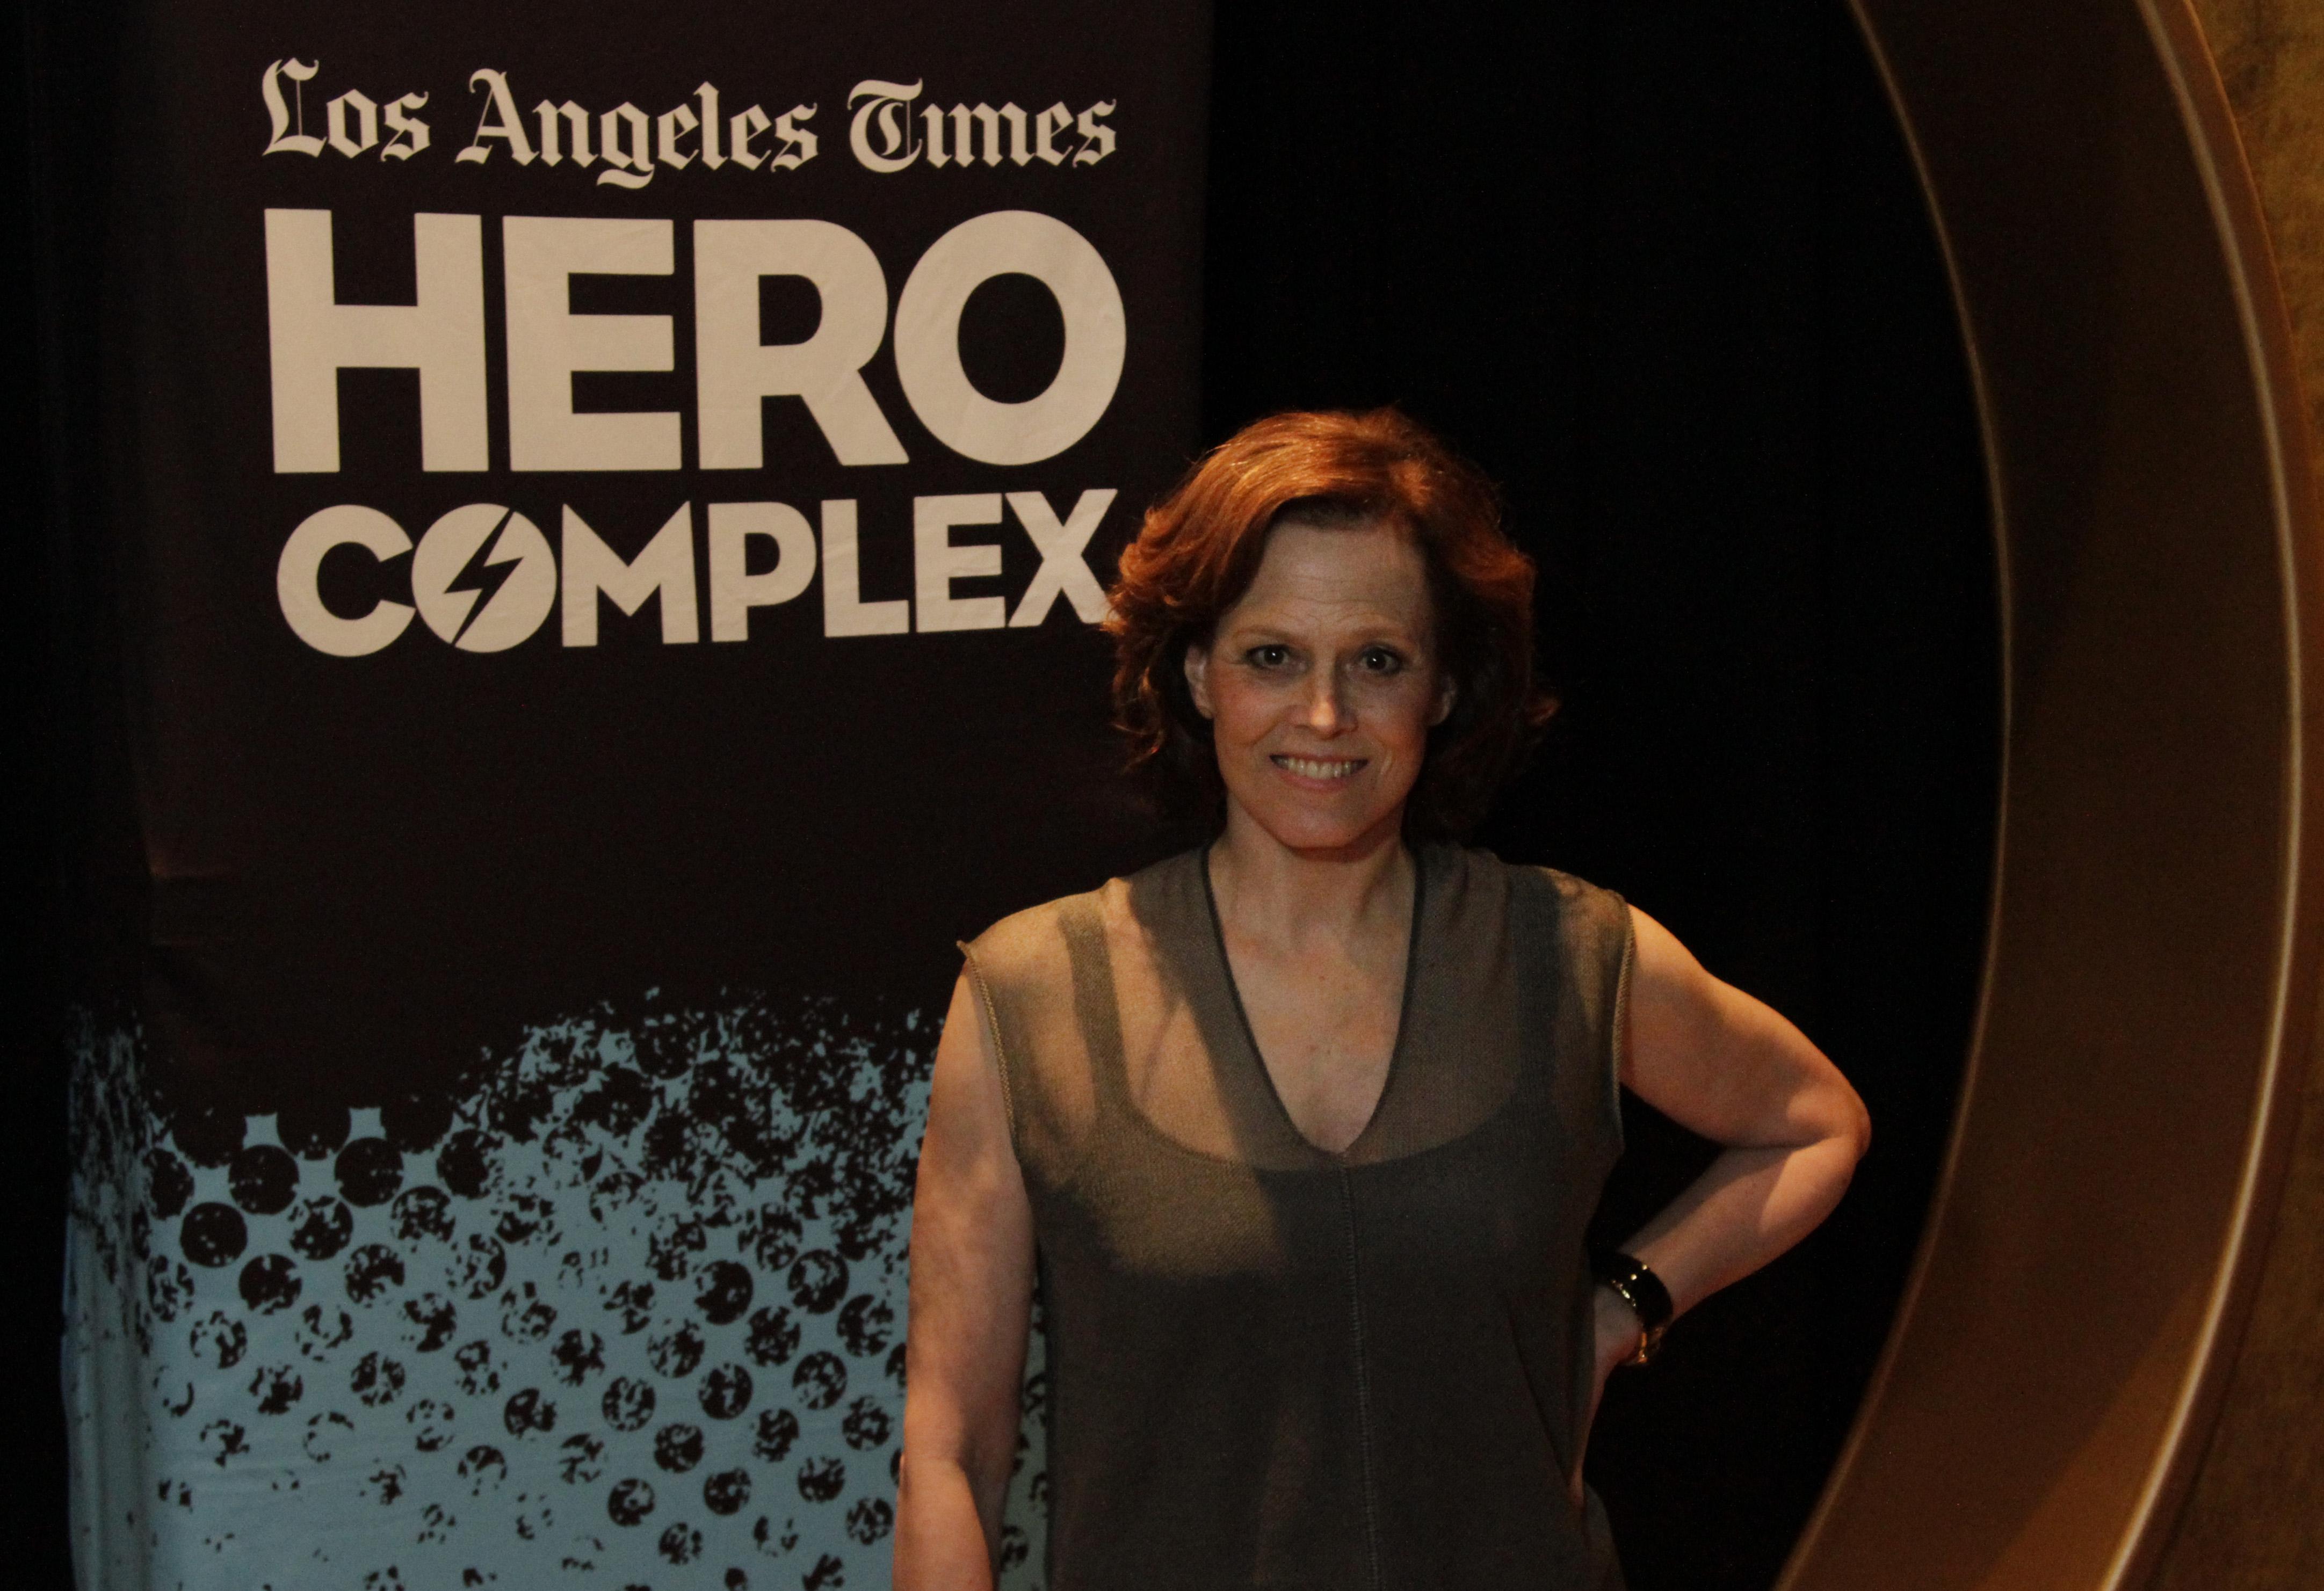 Sigourney Weaver Computer Backgrounds